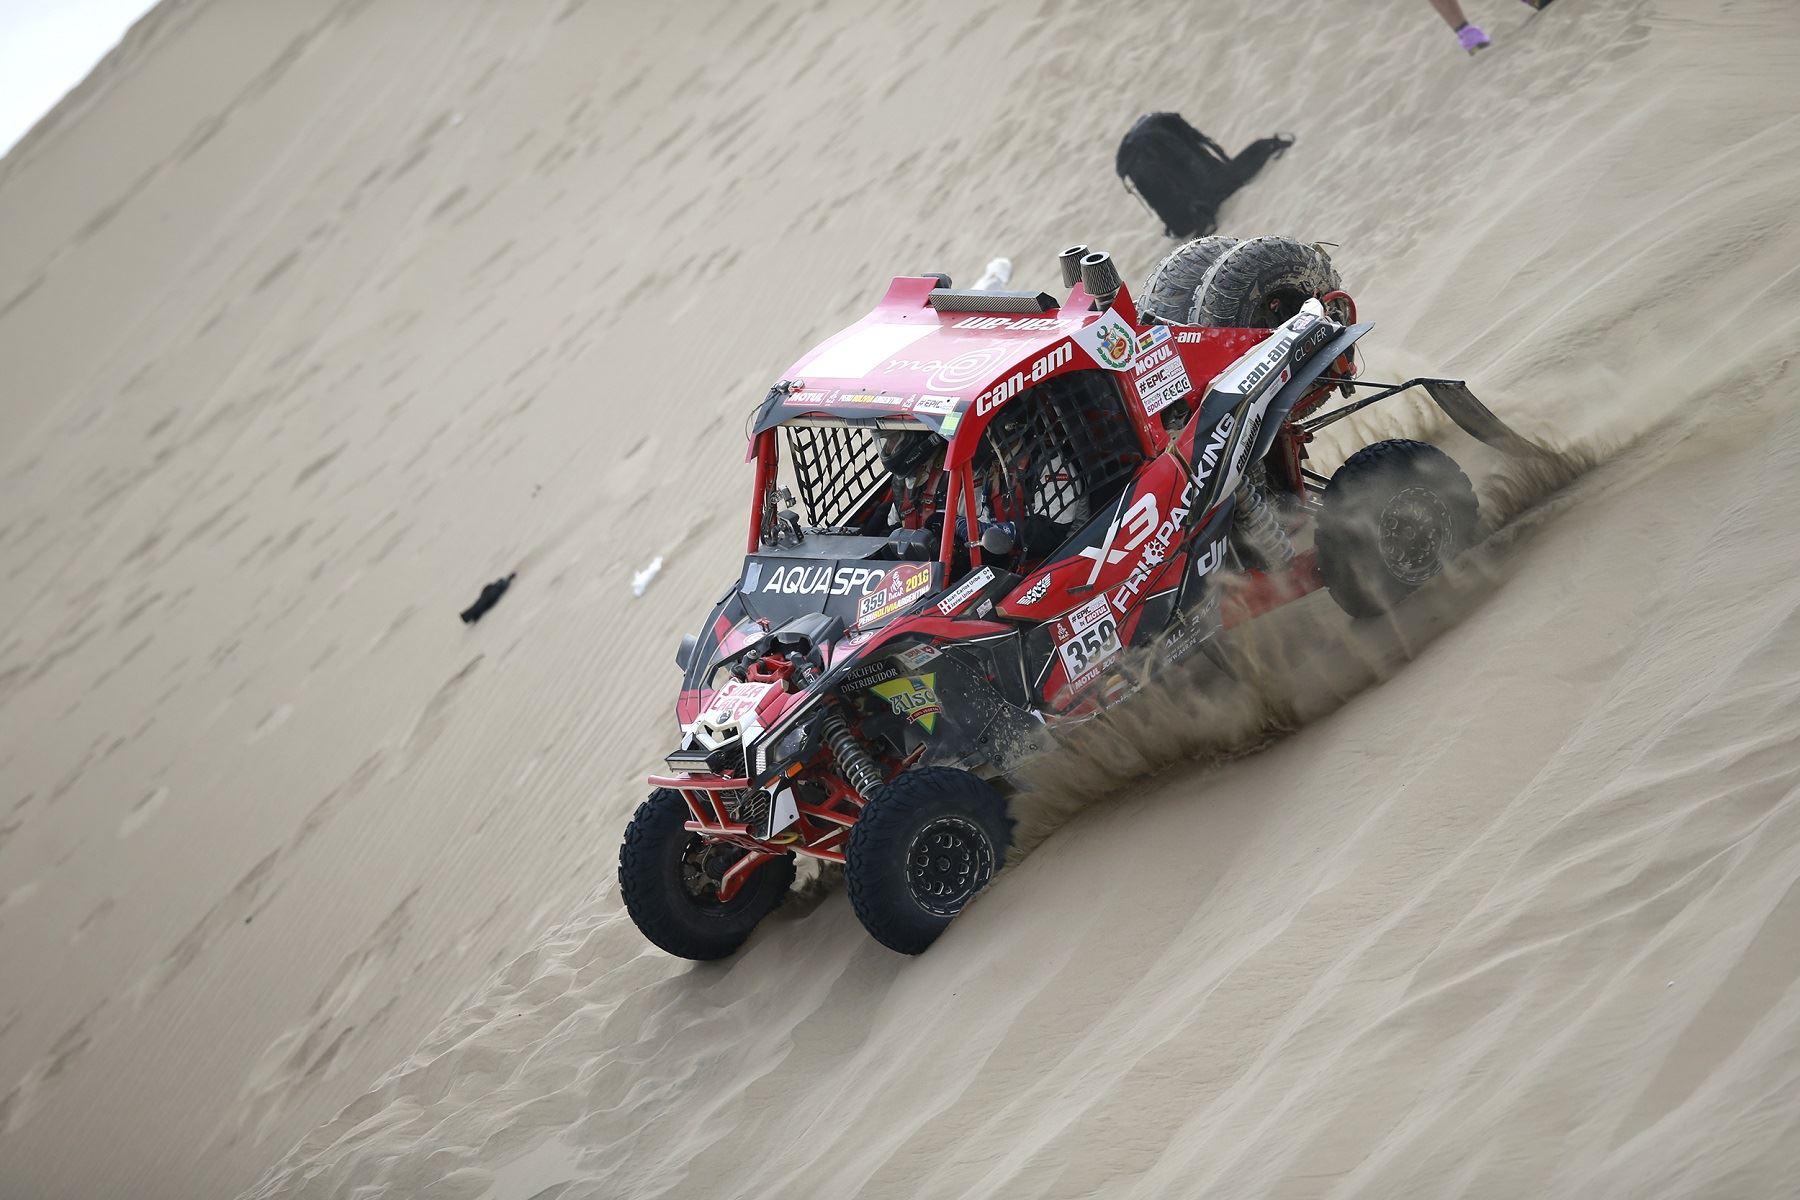 Peru's Uribe wins stage 3 of Dakar Rally, leads standings | News